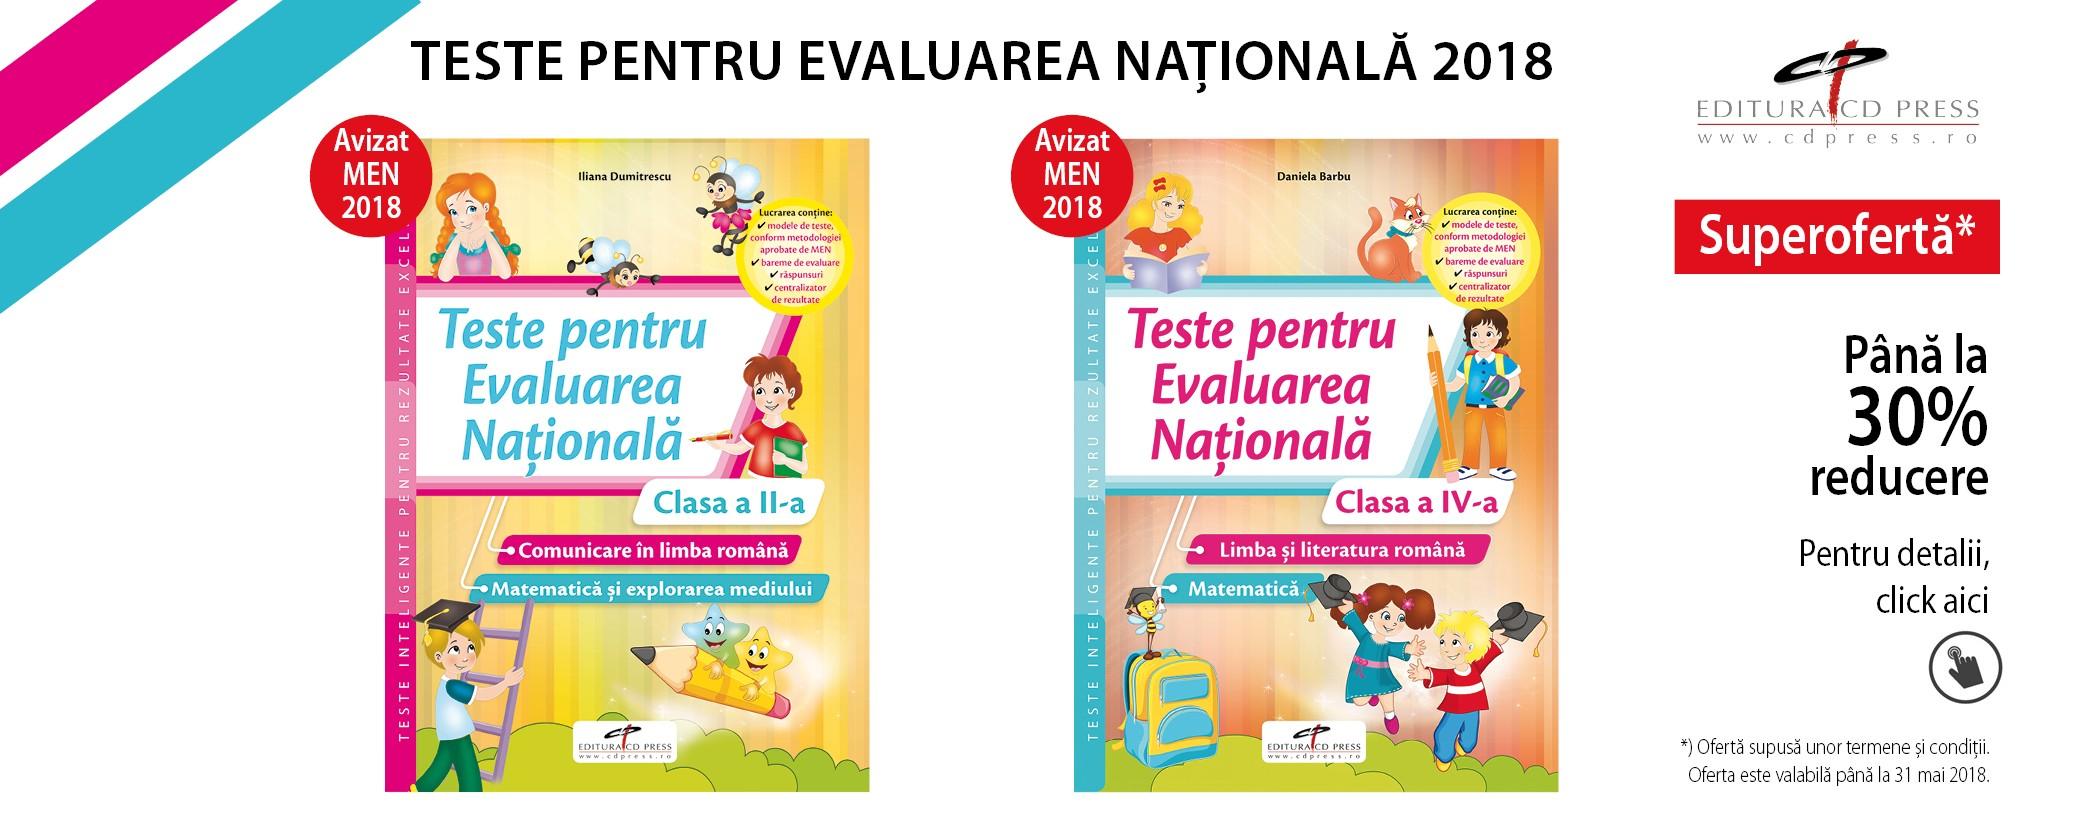 Teste evaluare nationala